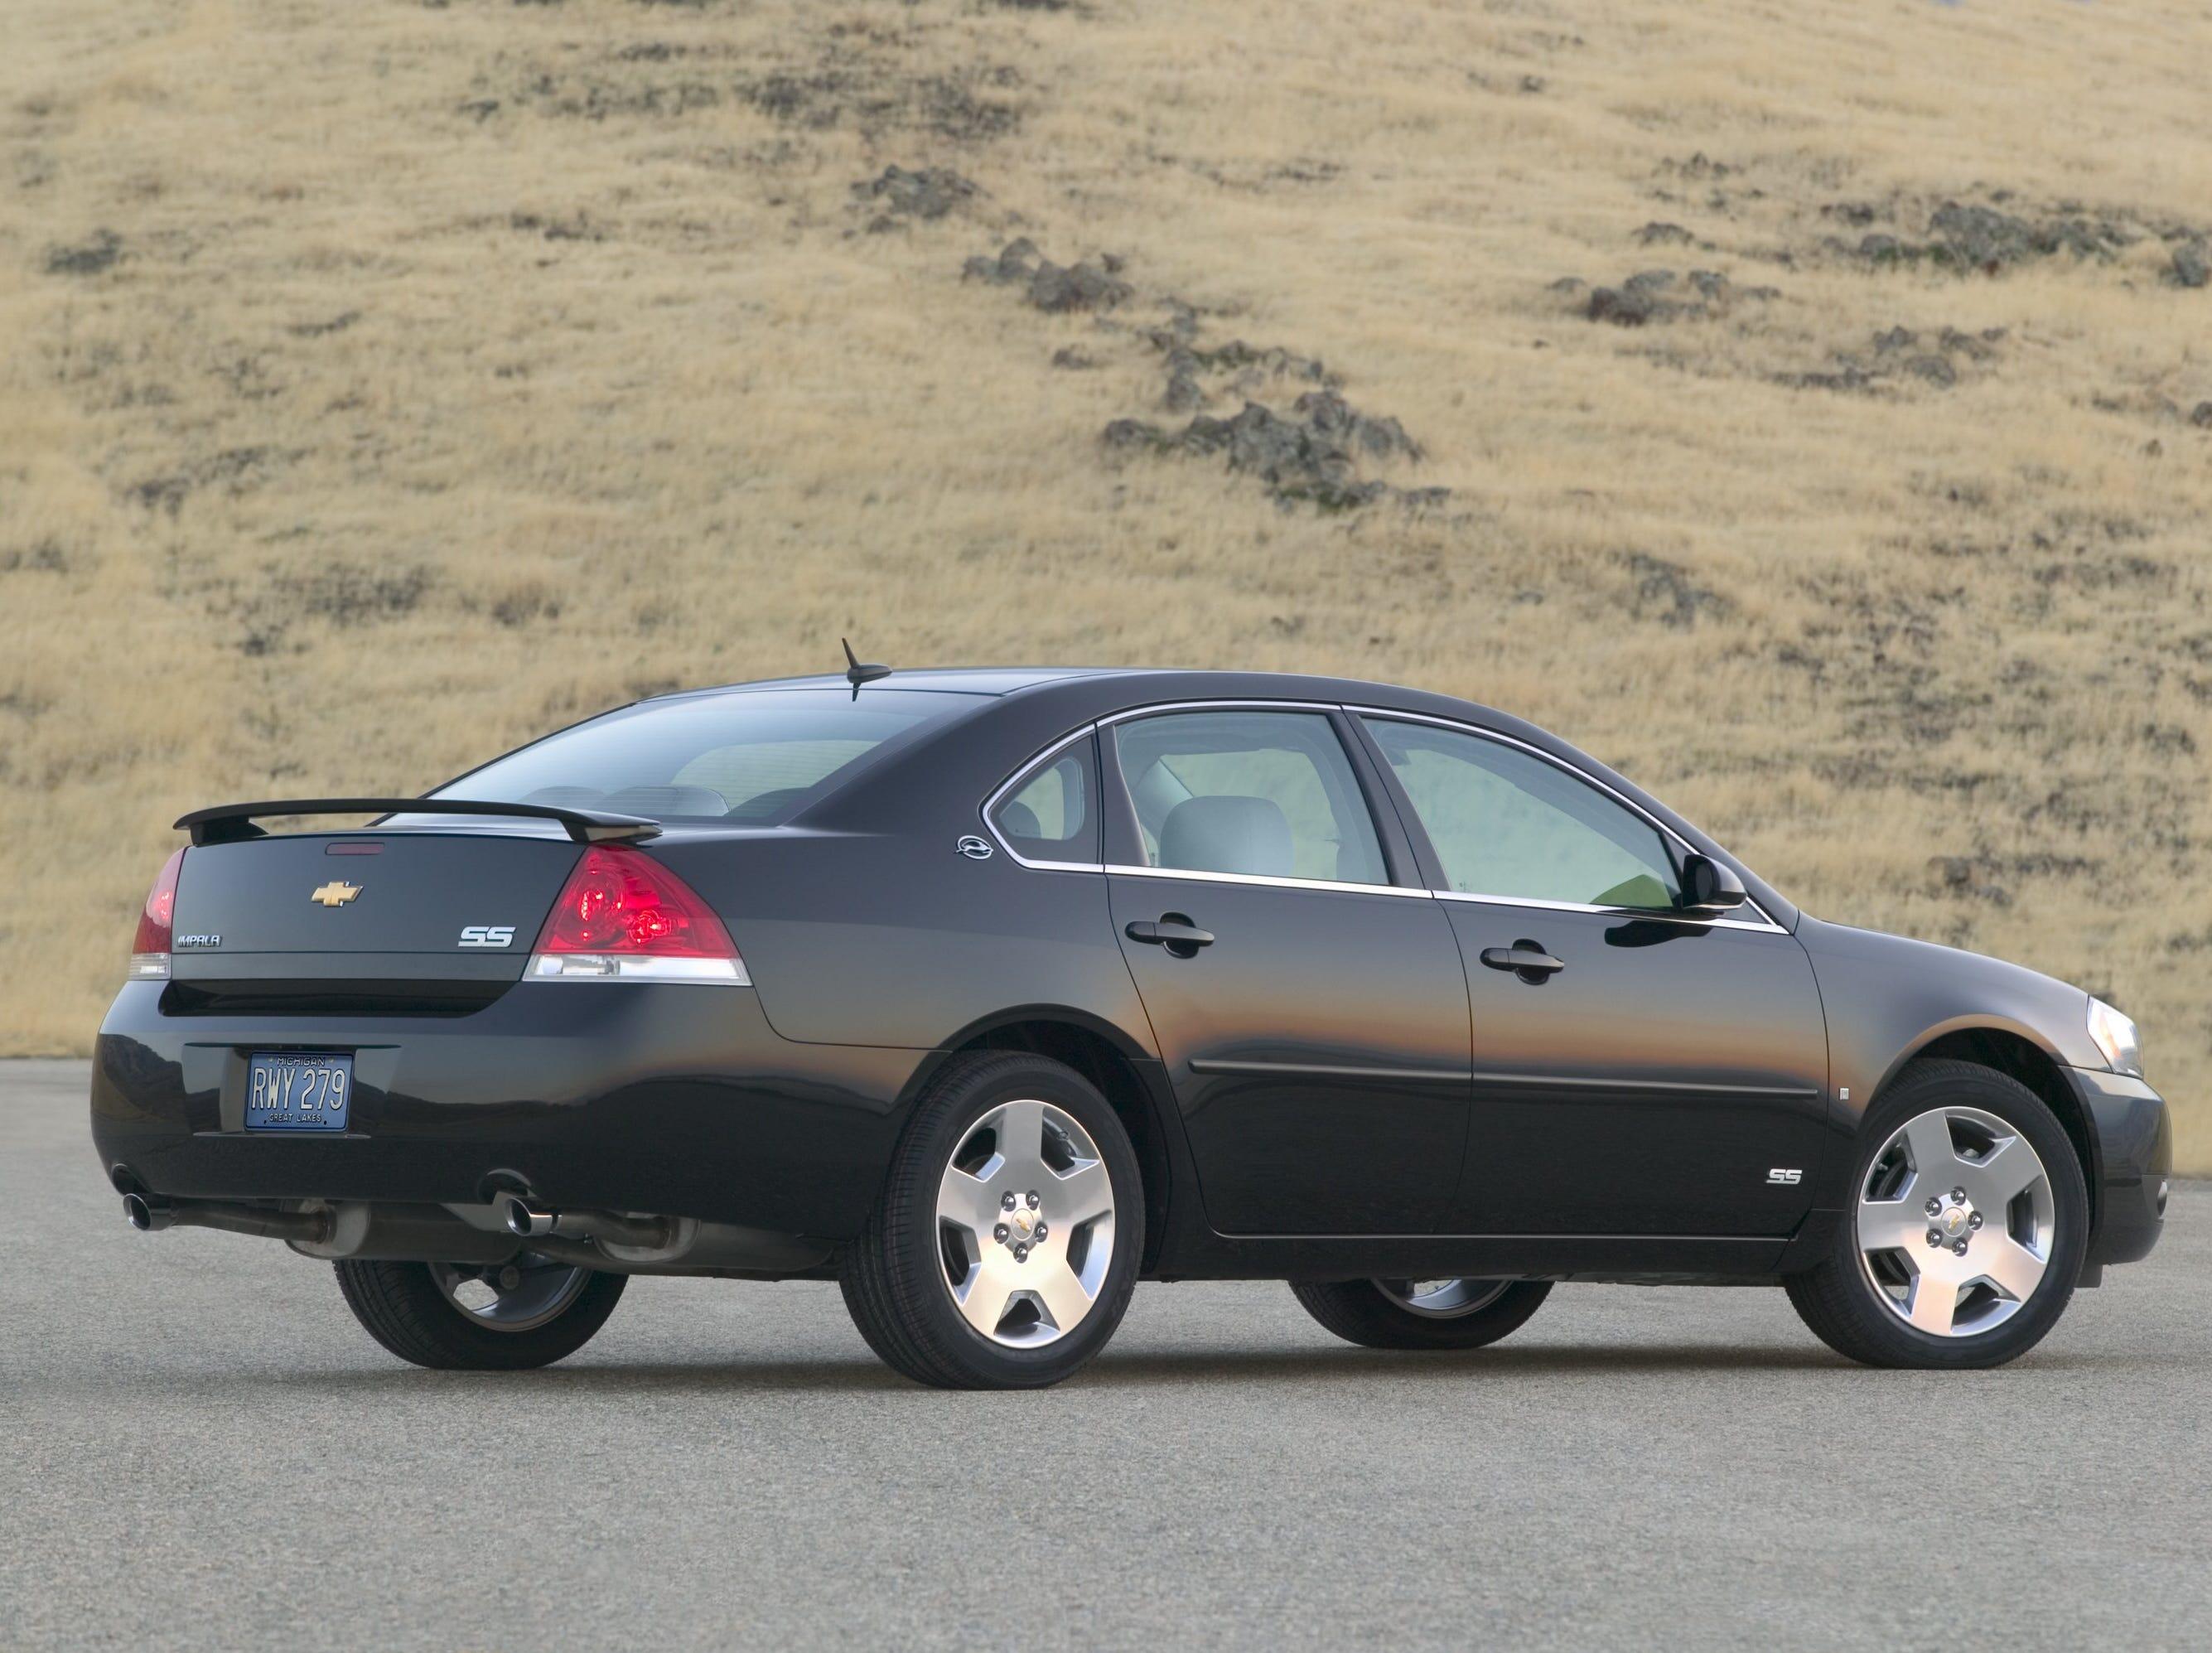 2008 Chevrolet Impala SS.